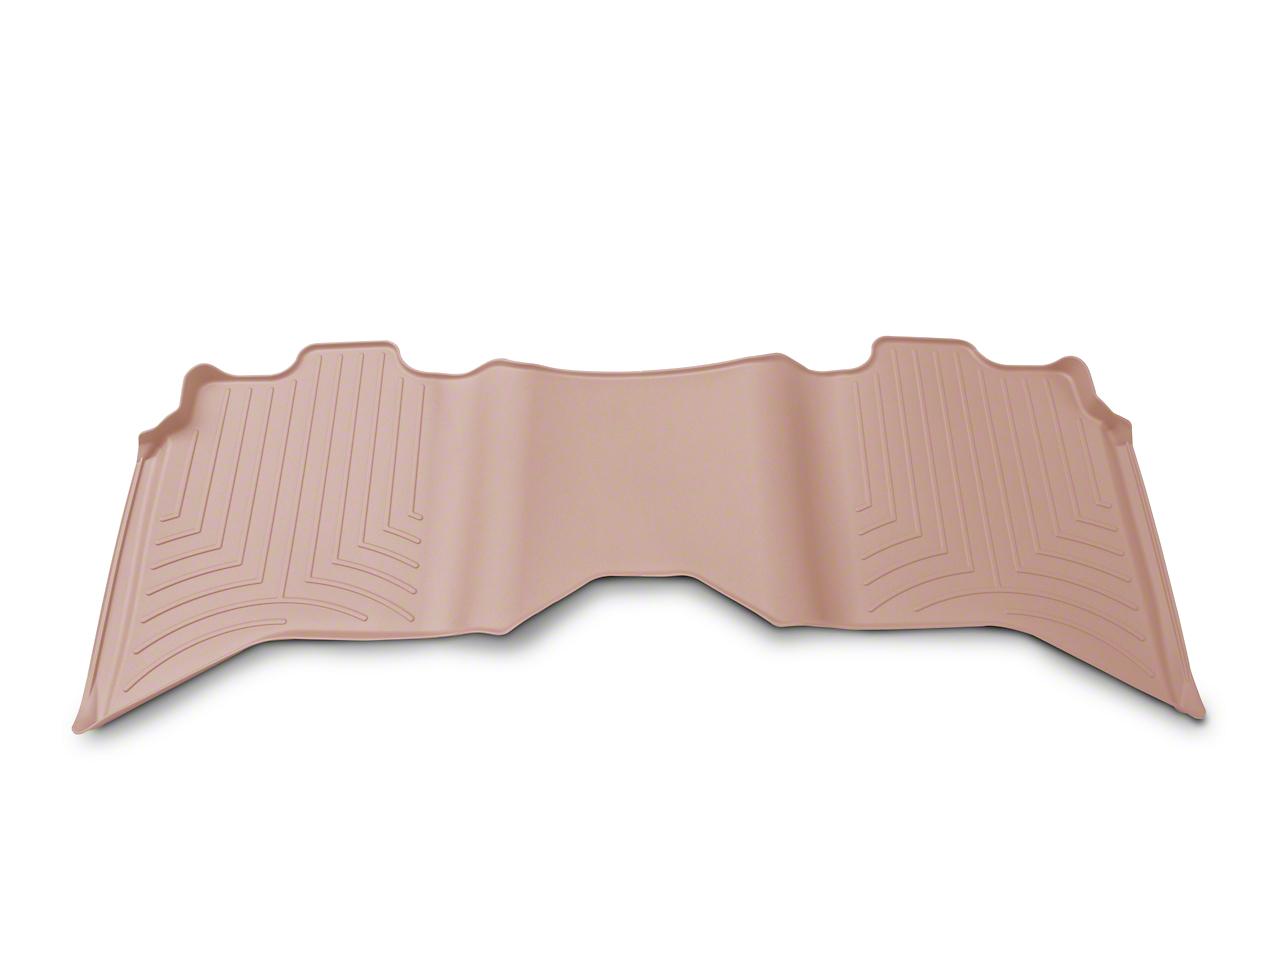 Weathertech DigitalFit Rear Floor Liner - Tan (09-18 RAM 1500 Quad Cab, Crew Cab)